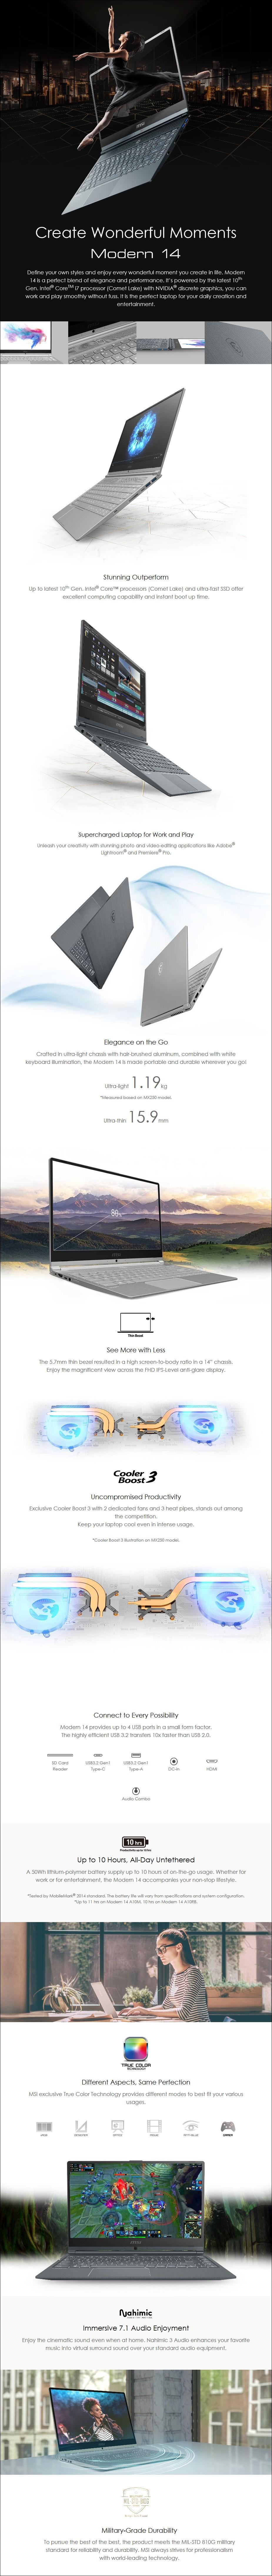 msi-modern-14-a10m-14-laptop-i5a10210u-8gb-512gb-ssd-w10h-ac28922-3.jpg